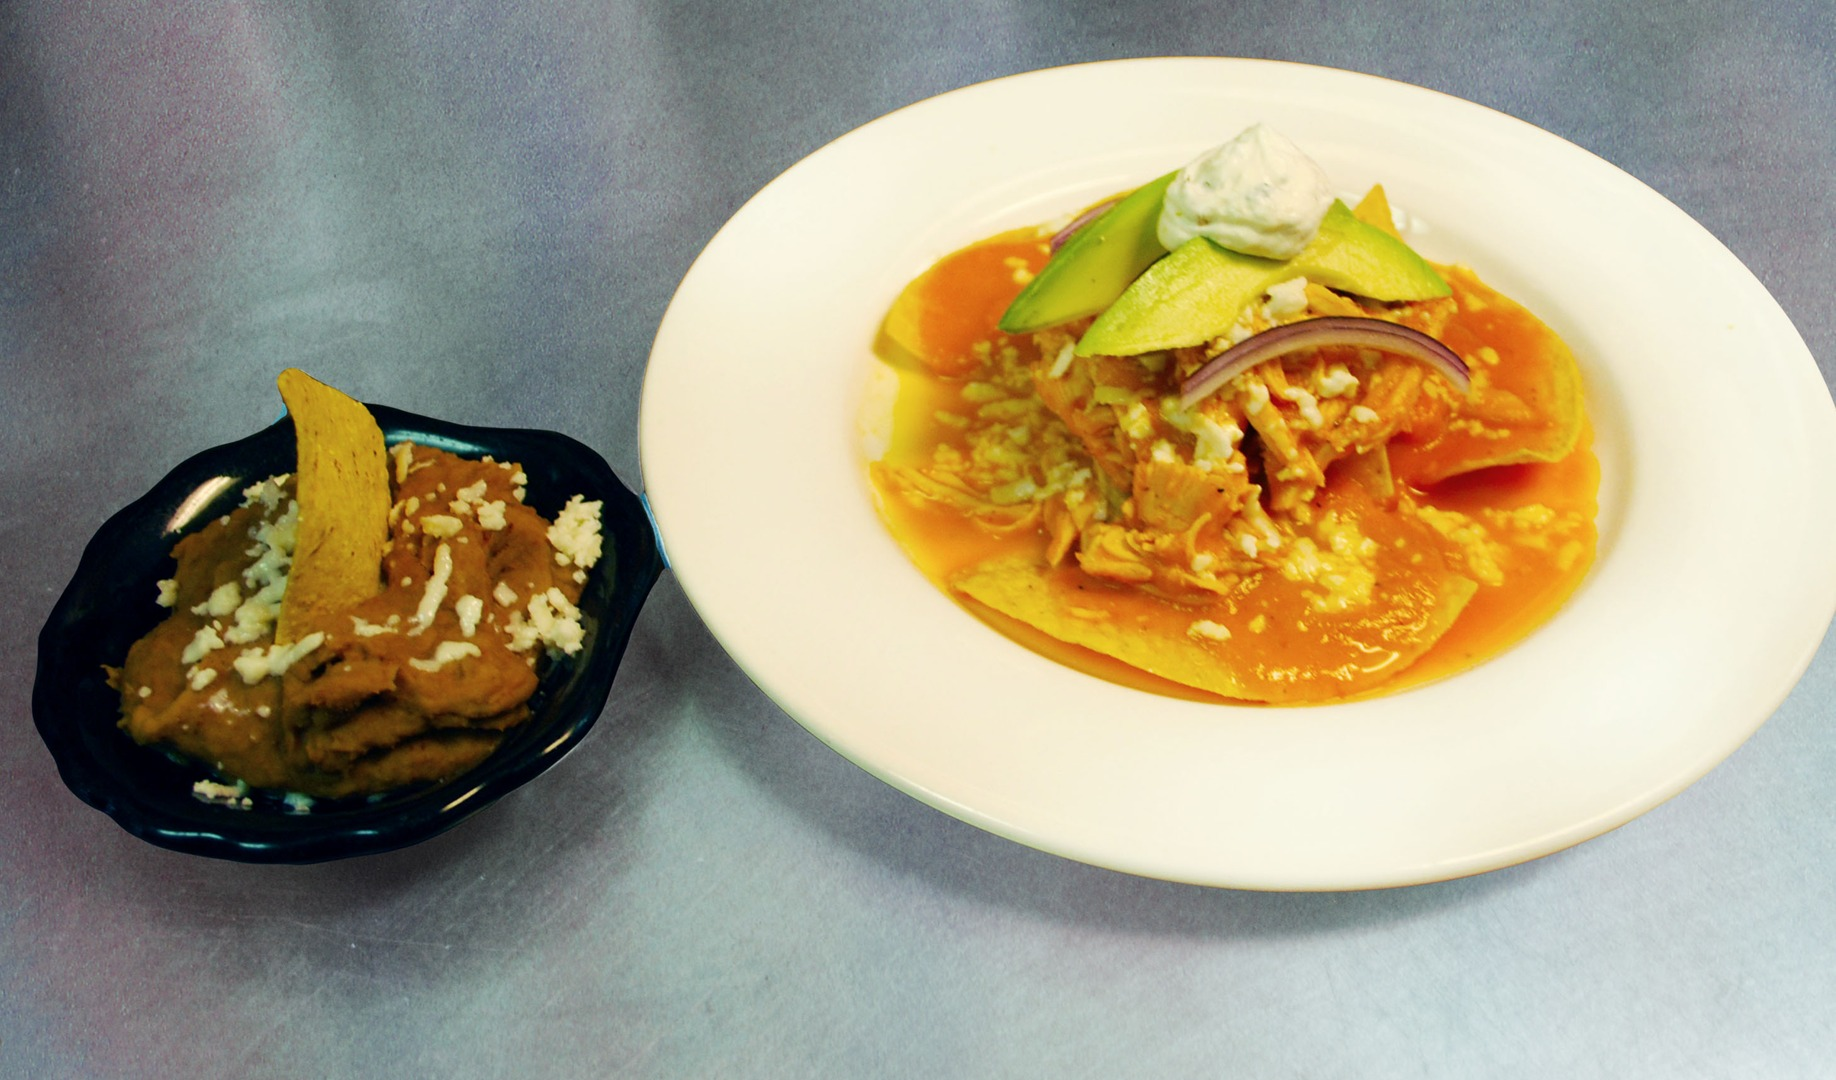 Orale Contemporary Mexican Kitchen